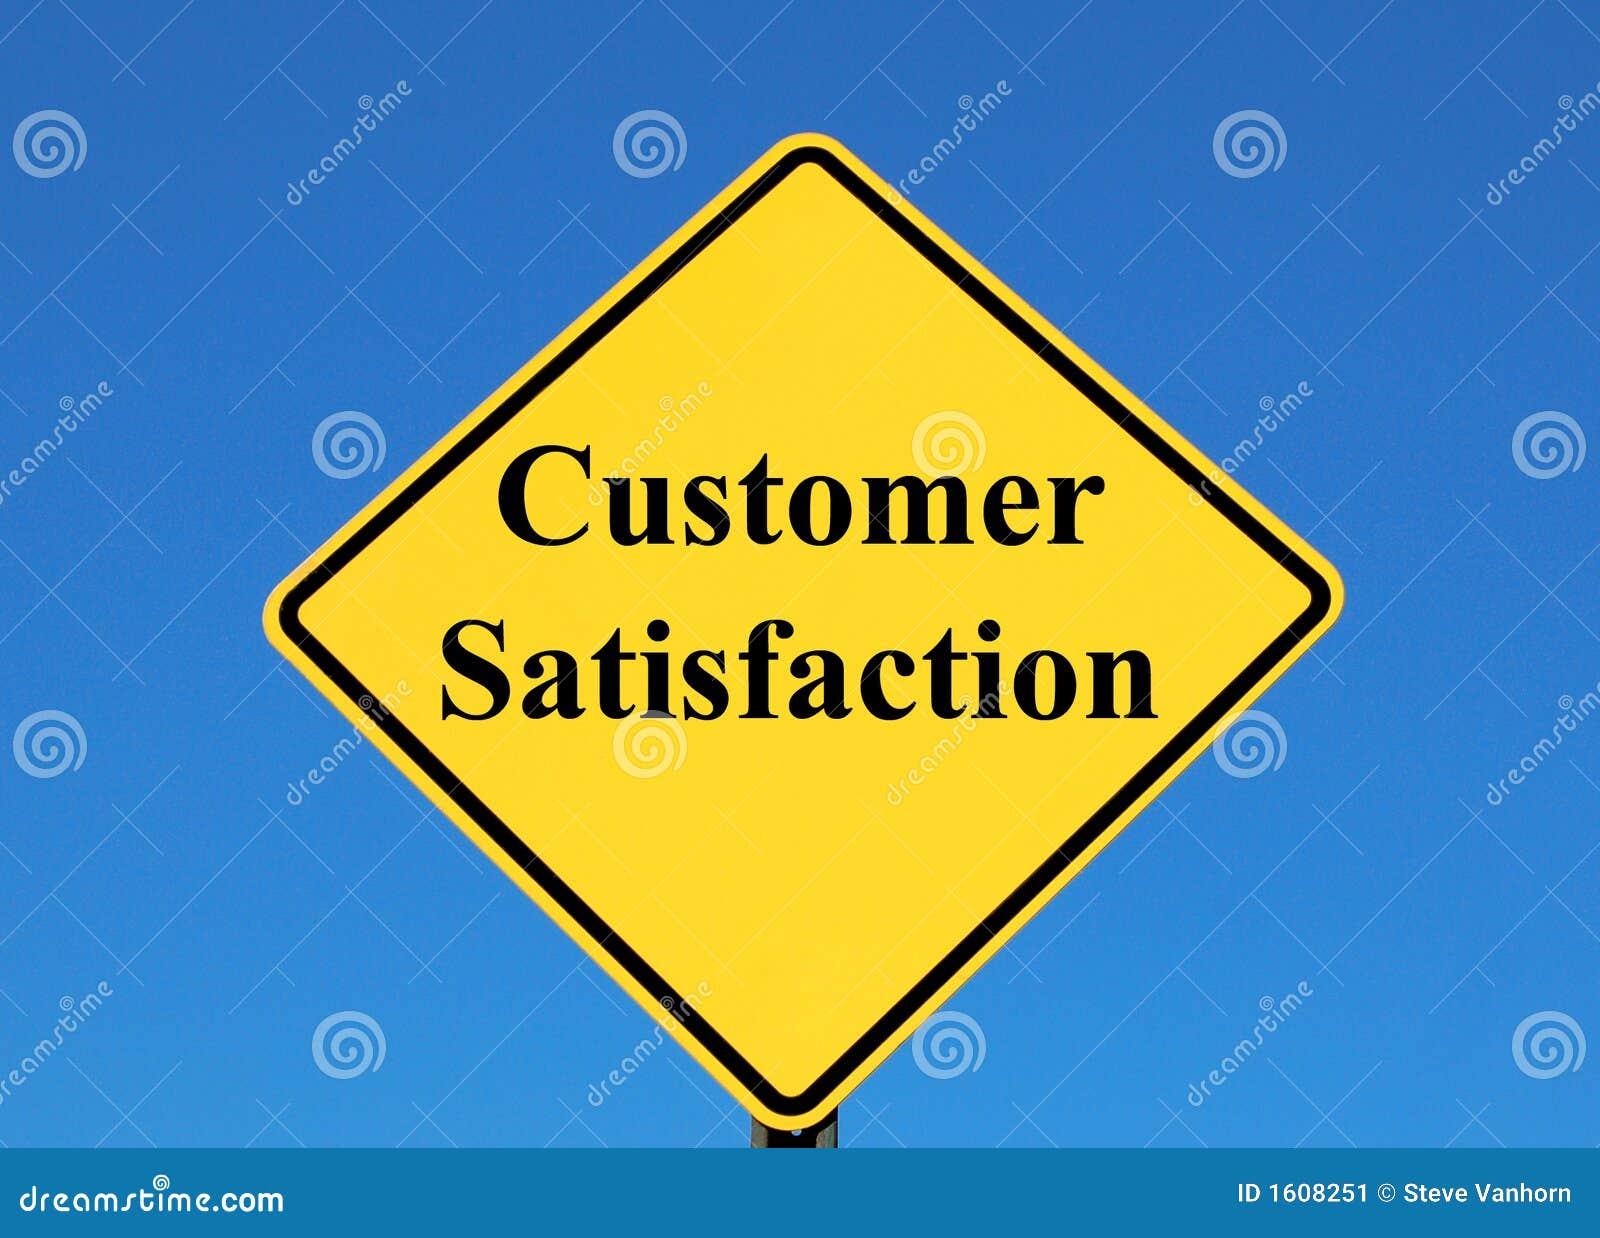 Customer Satisfaction Stock Image - Image: 1608251